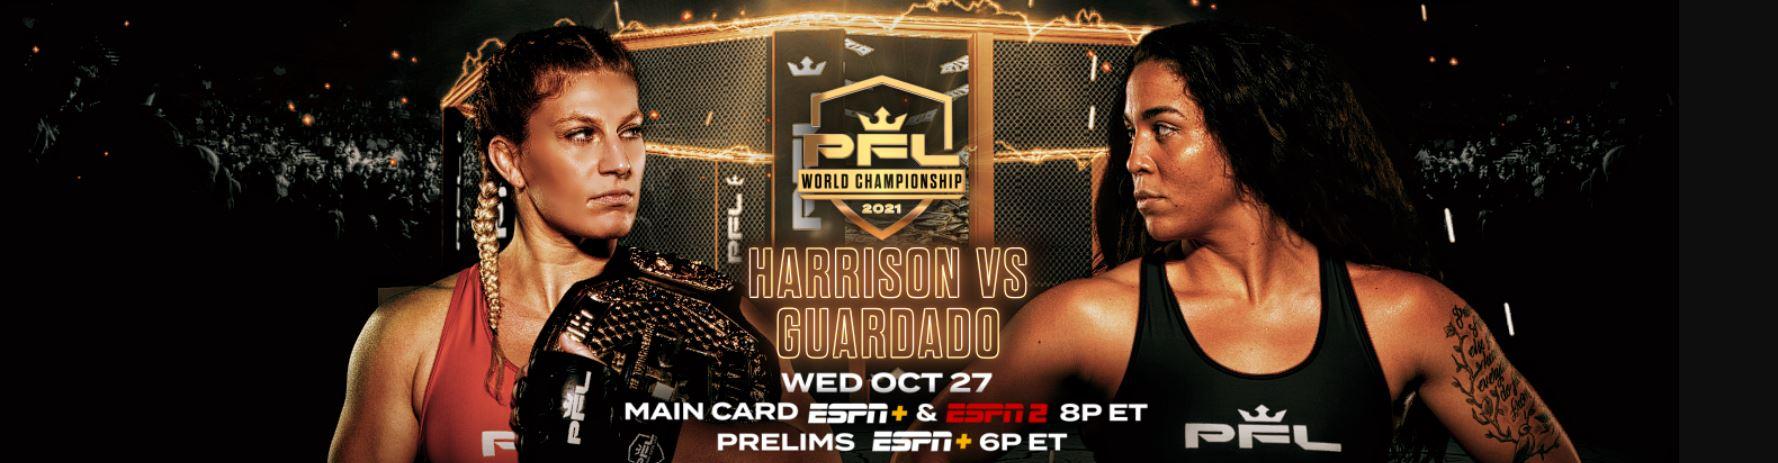 Bet on PFL Championships Finals Best PFL MMA Betting Sites | Bet on Kayla Harrison